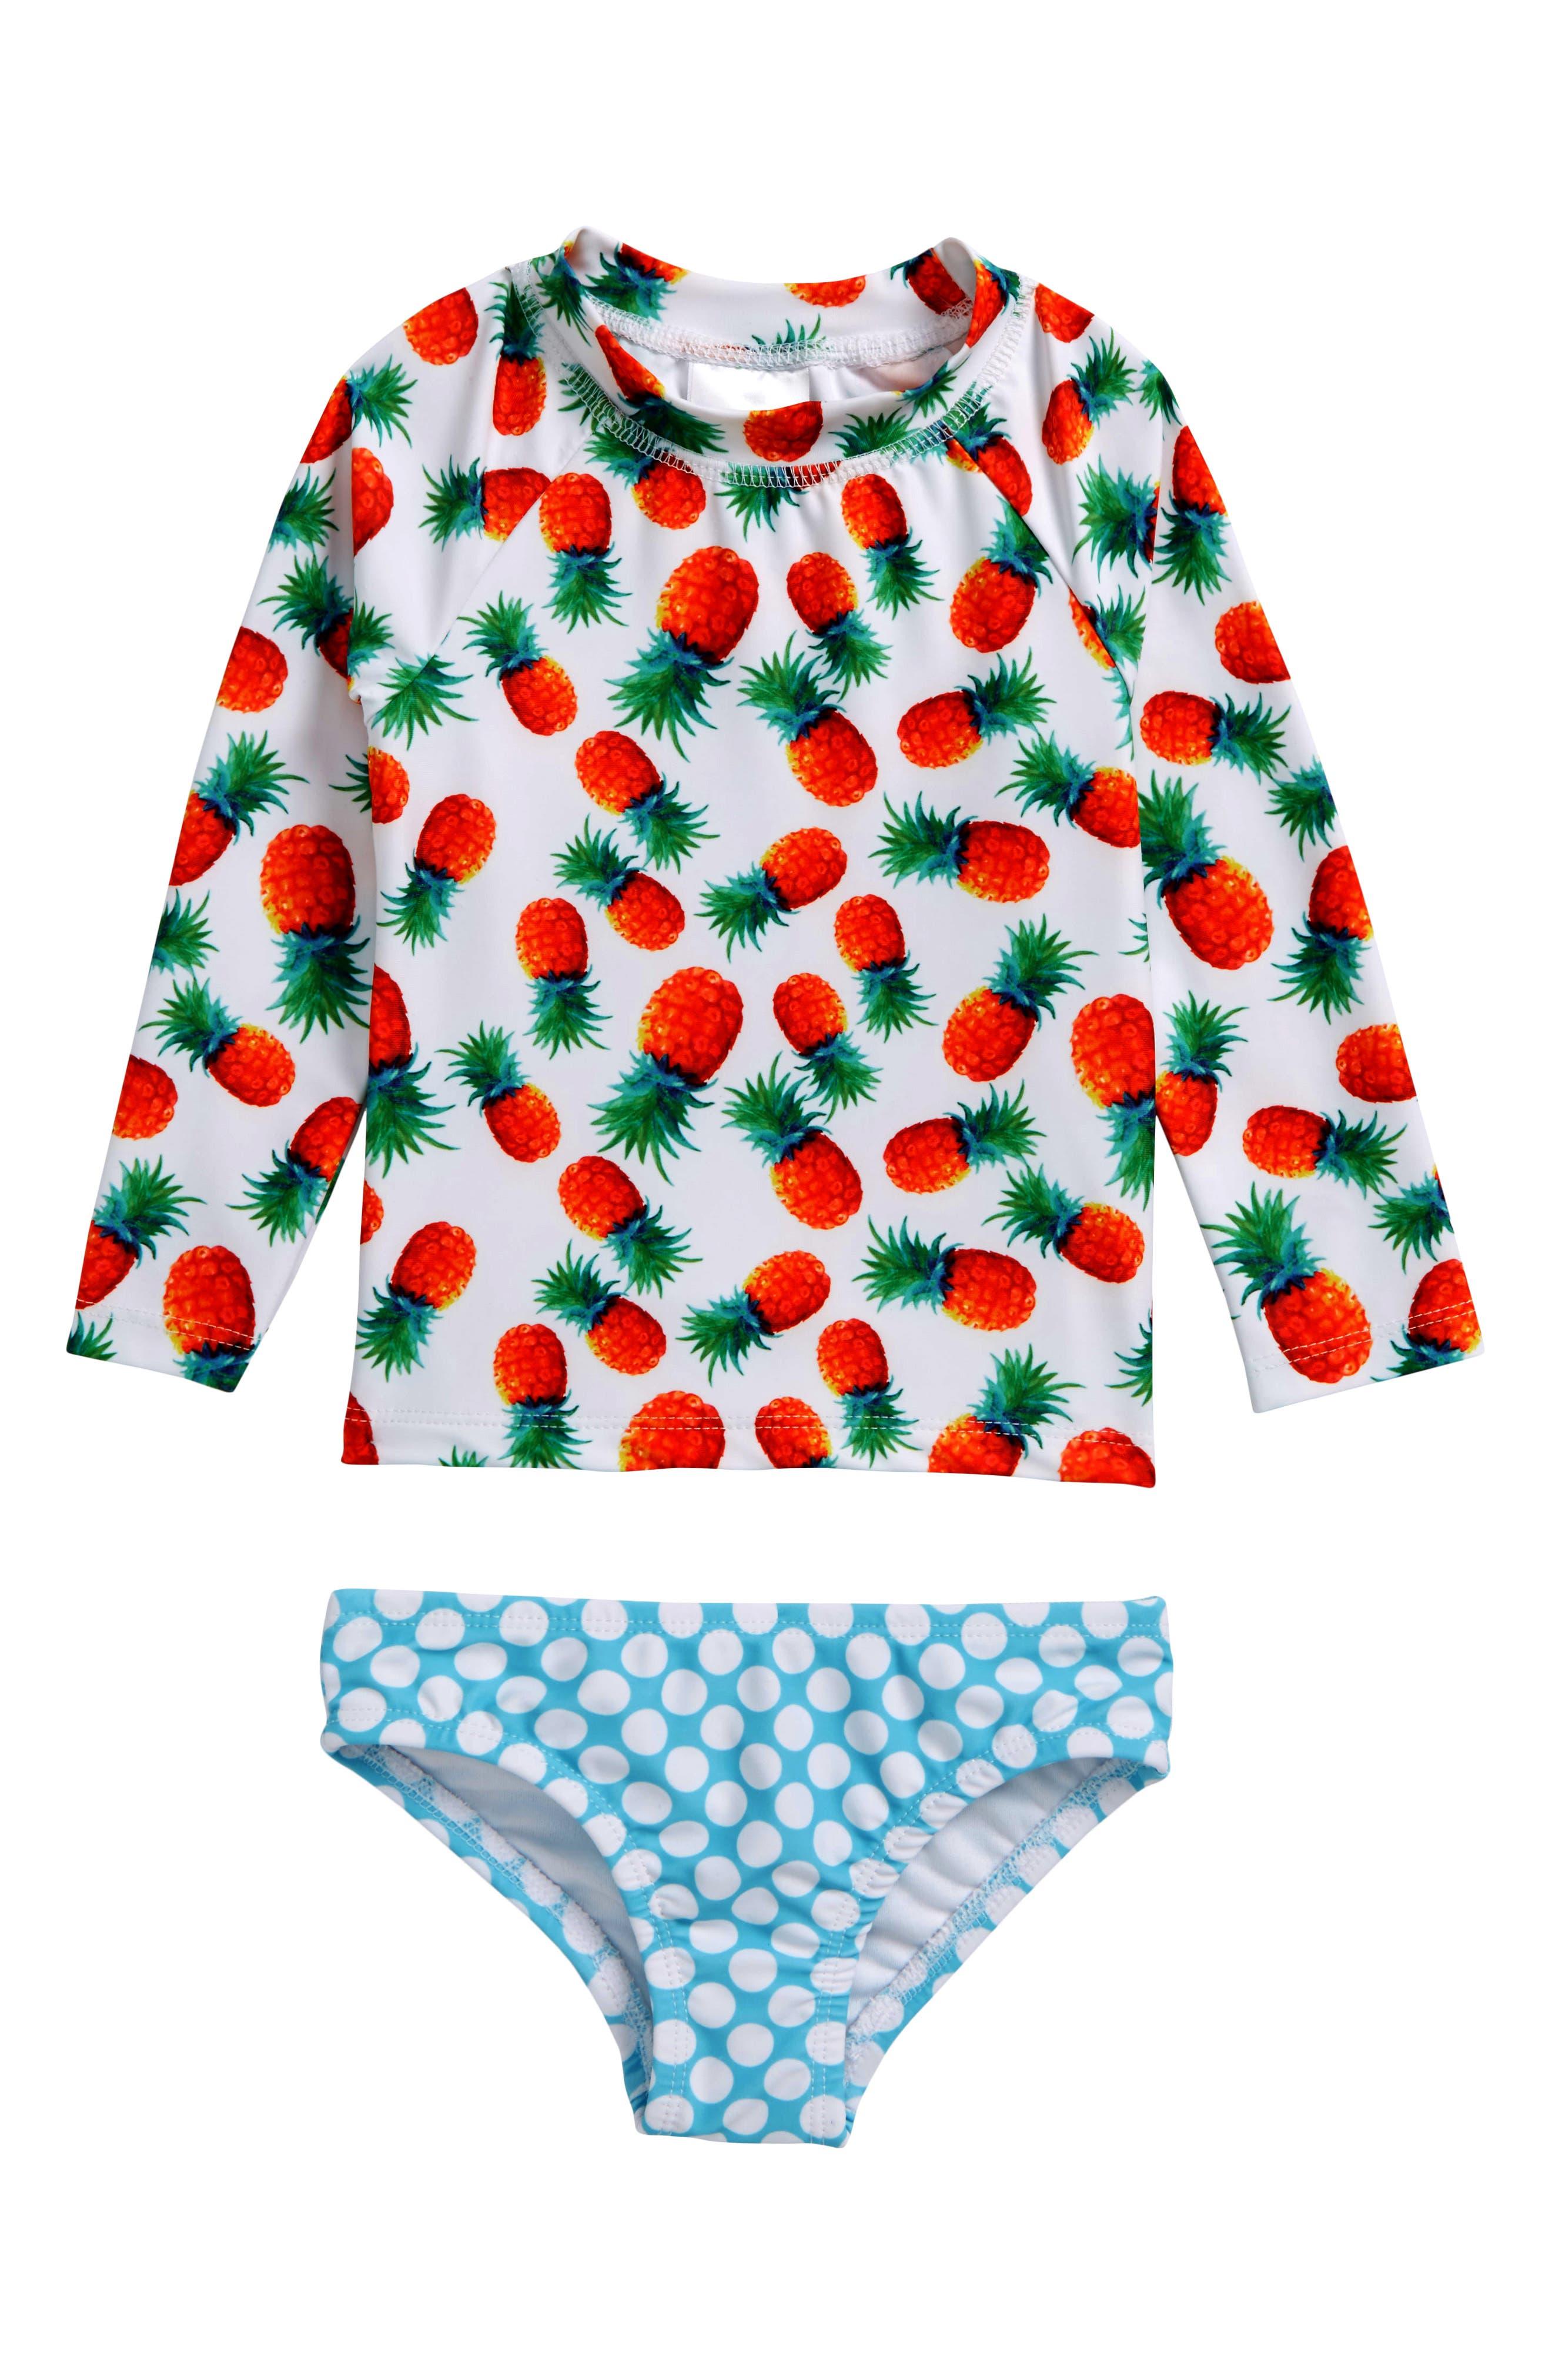 Pineapple Disco Two-Piece Rashguard Swimsuit,                             Main thumbnail 1, color,                             White Multi